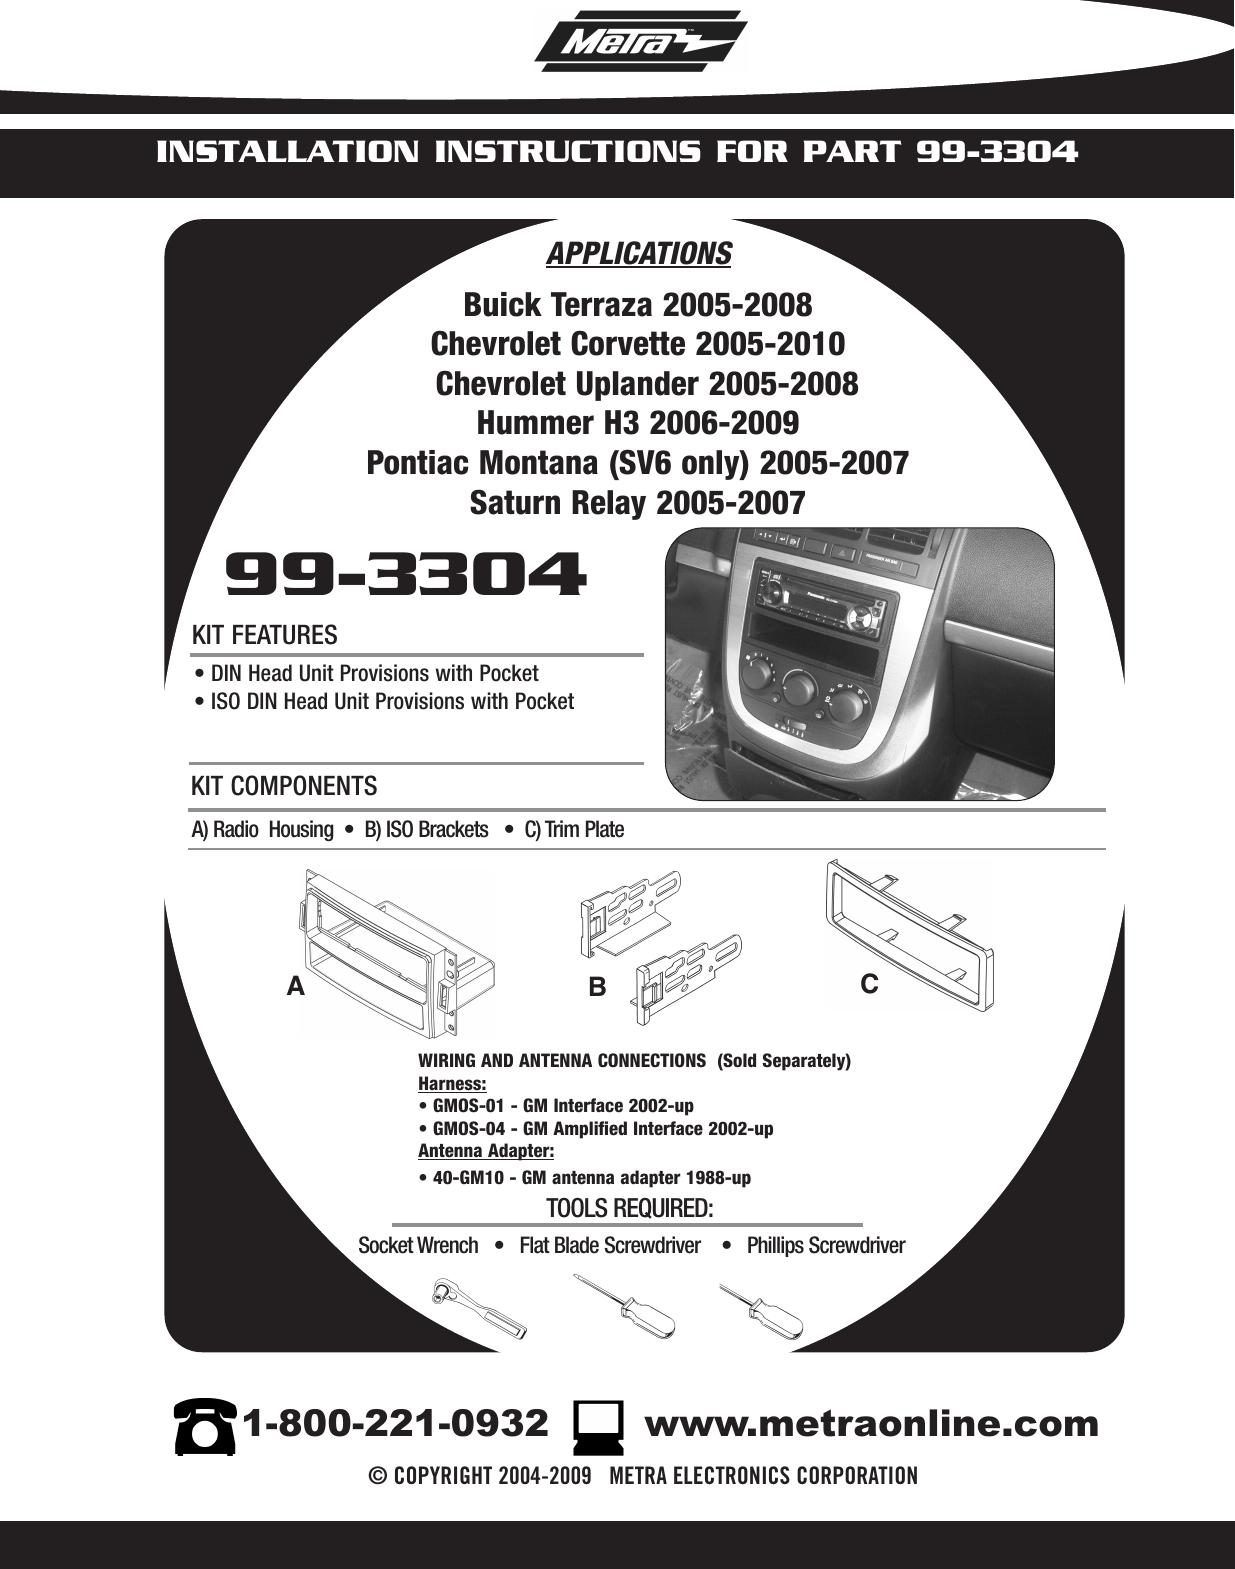 Chrysler crossfire ebooks user manuals guide user manuals array dodge nitro ebooks user manuals guide user manuals rh dodge nitro ebooks user manuals fandeluxe Gallery